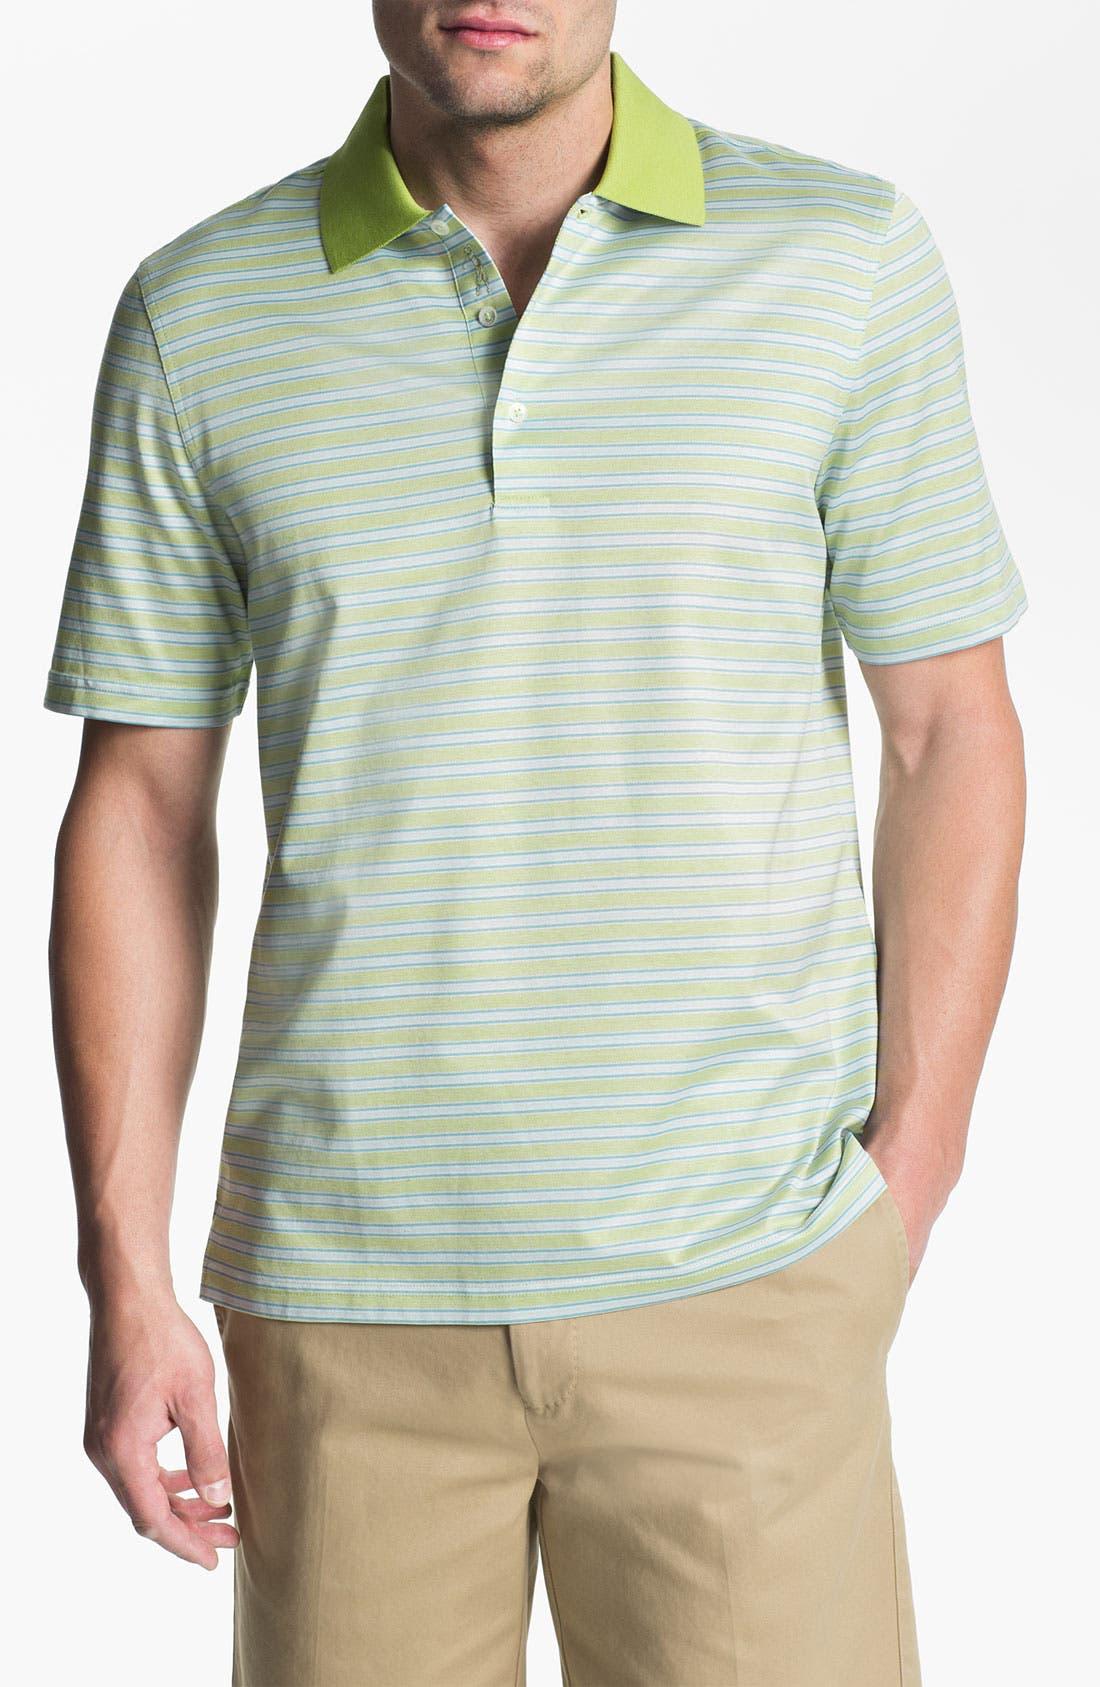 Alternate Image 1 Selected - Bobby Jones 'Birdseye' Golf Polo